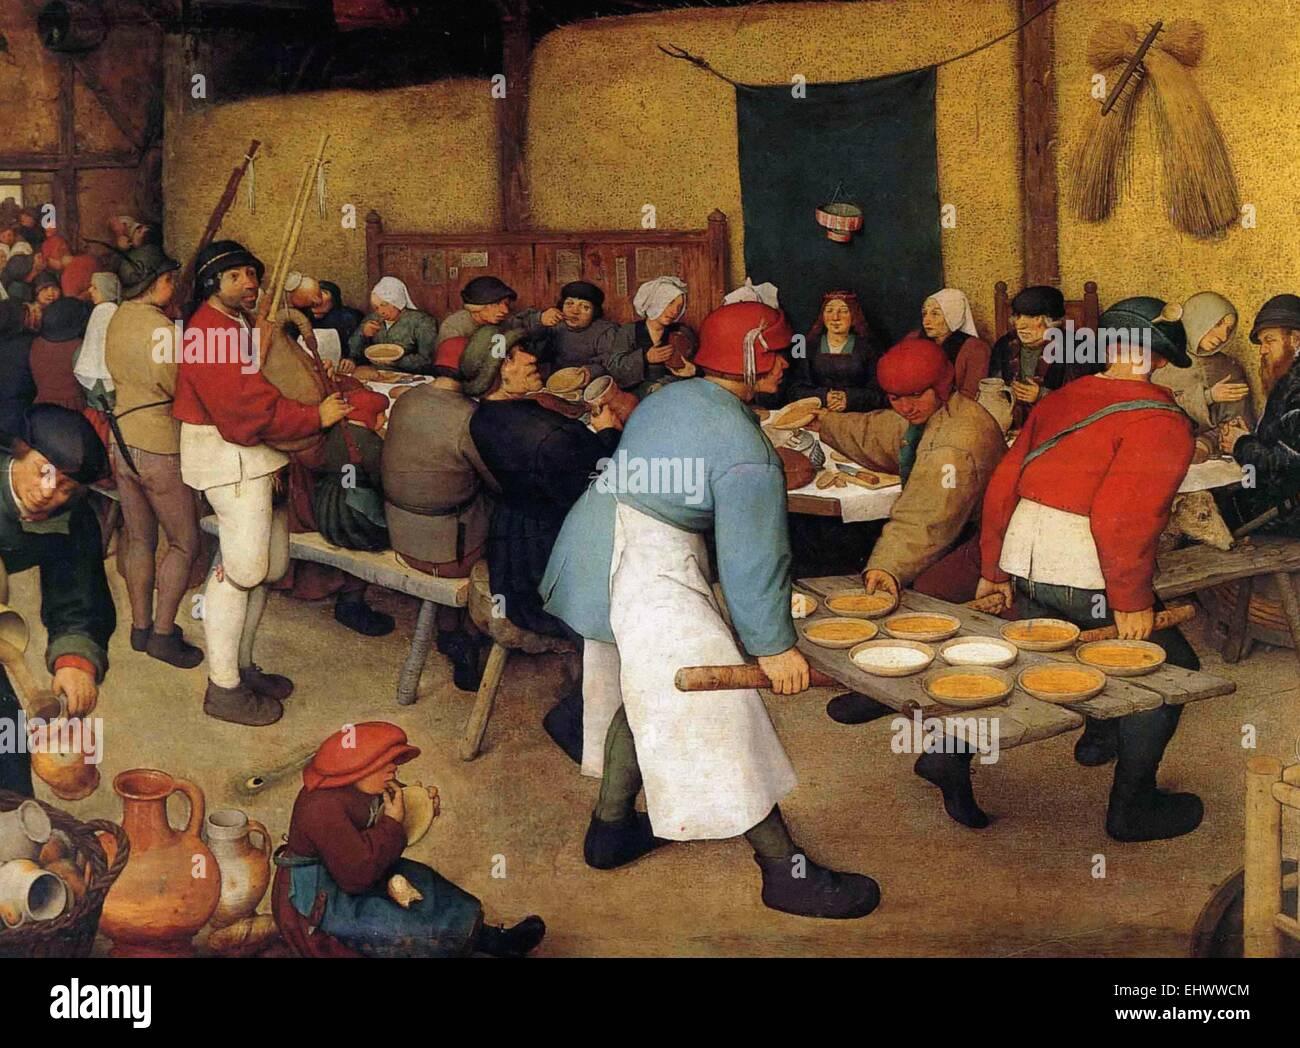 Pieter Bruegel the Elder  The Peasant Wedding - Stock Image